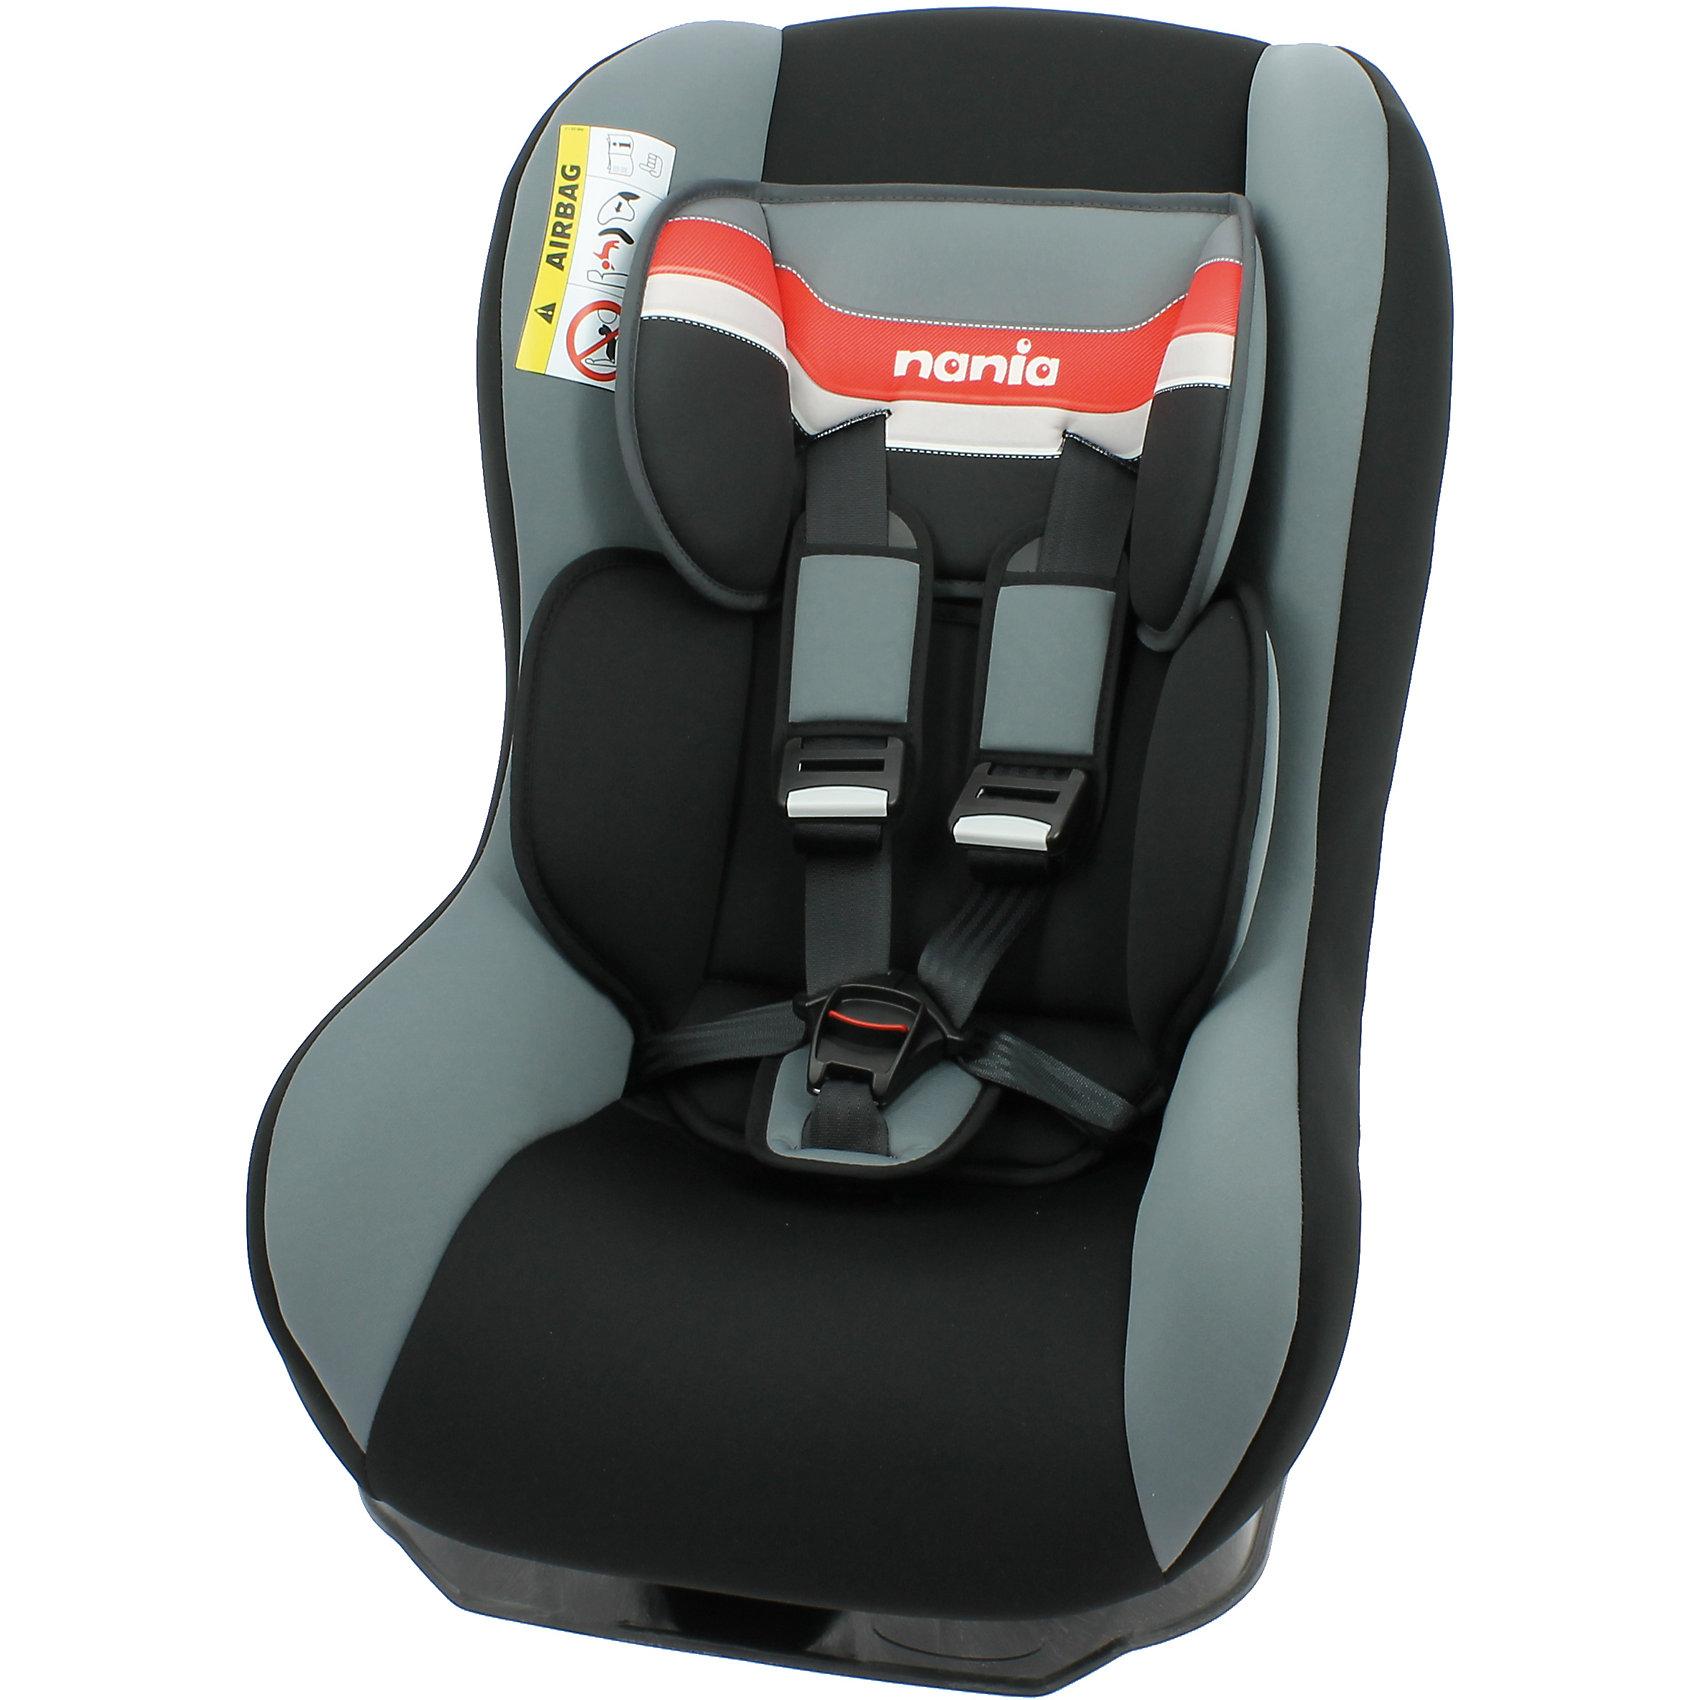 Nania Автокресло Driver FST, 0-18 кг., Nania, horizon red автокресло nania driver fst pop red